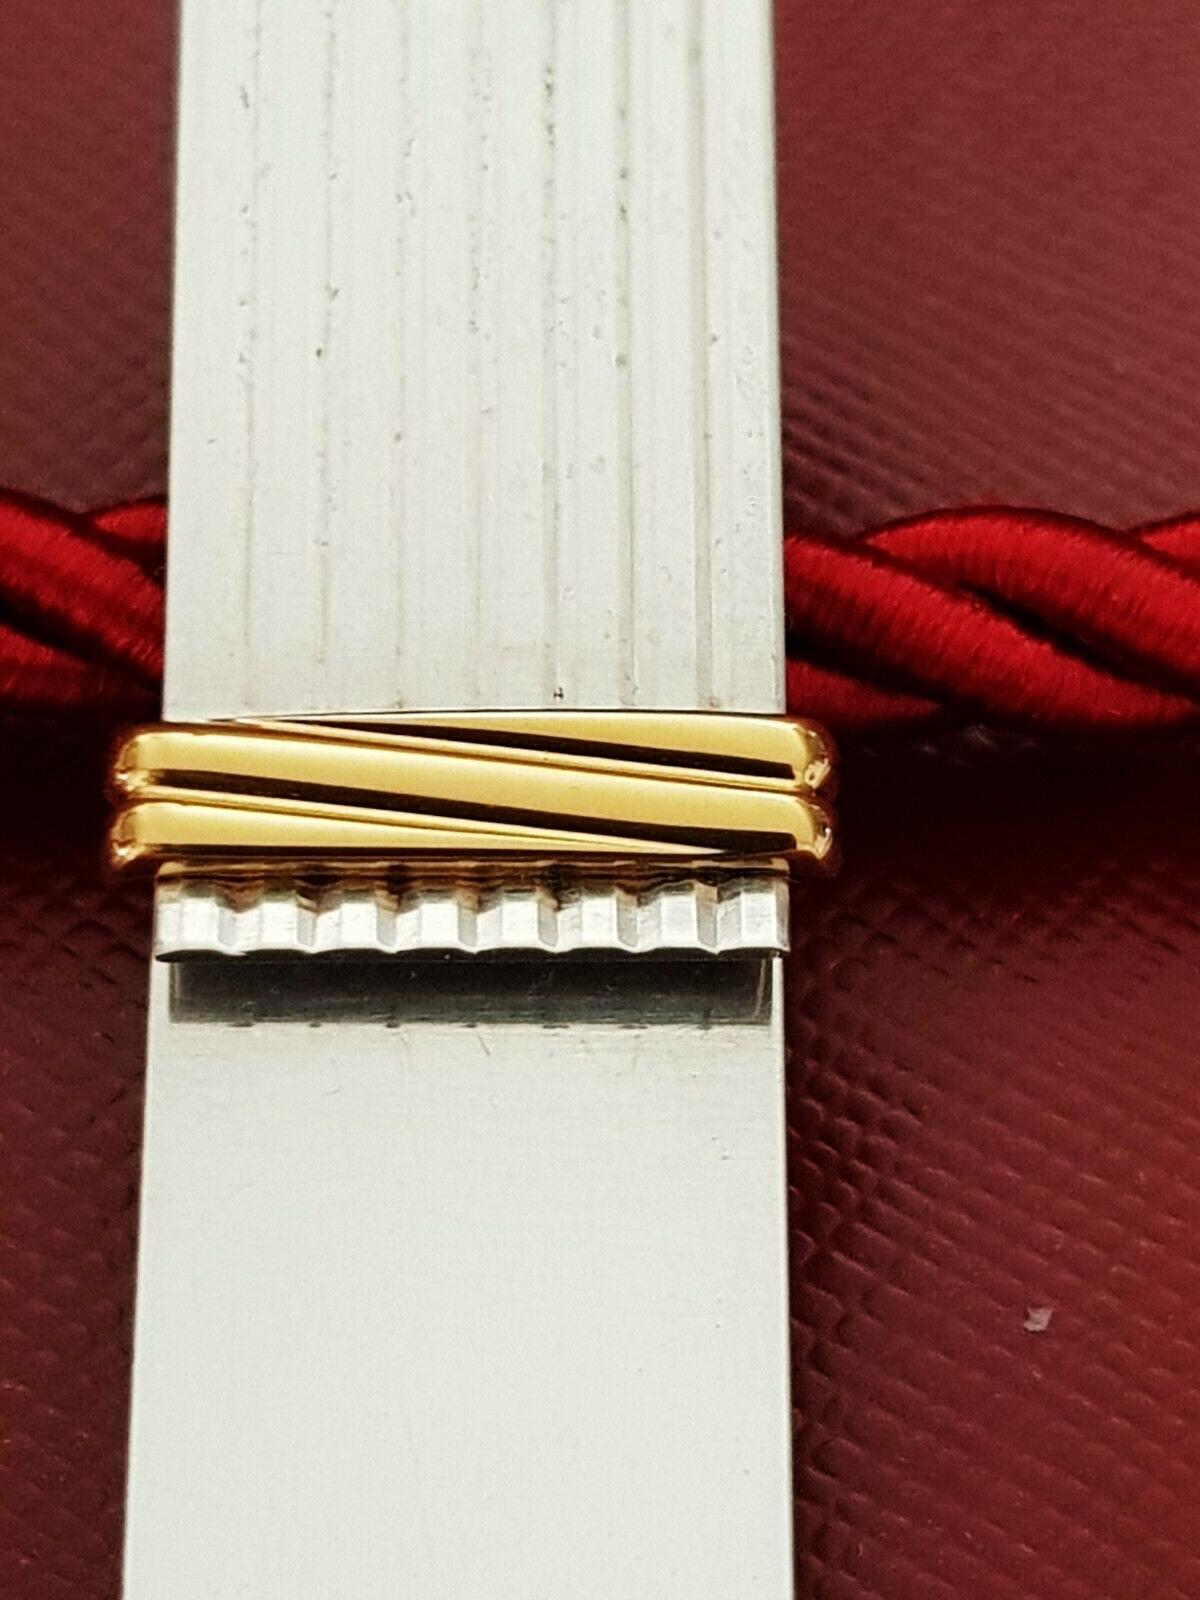 Lot 3 - Cartier Gold Plated & Silver Must De Cartier Edition Money Clip